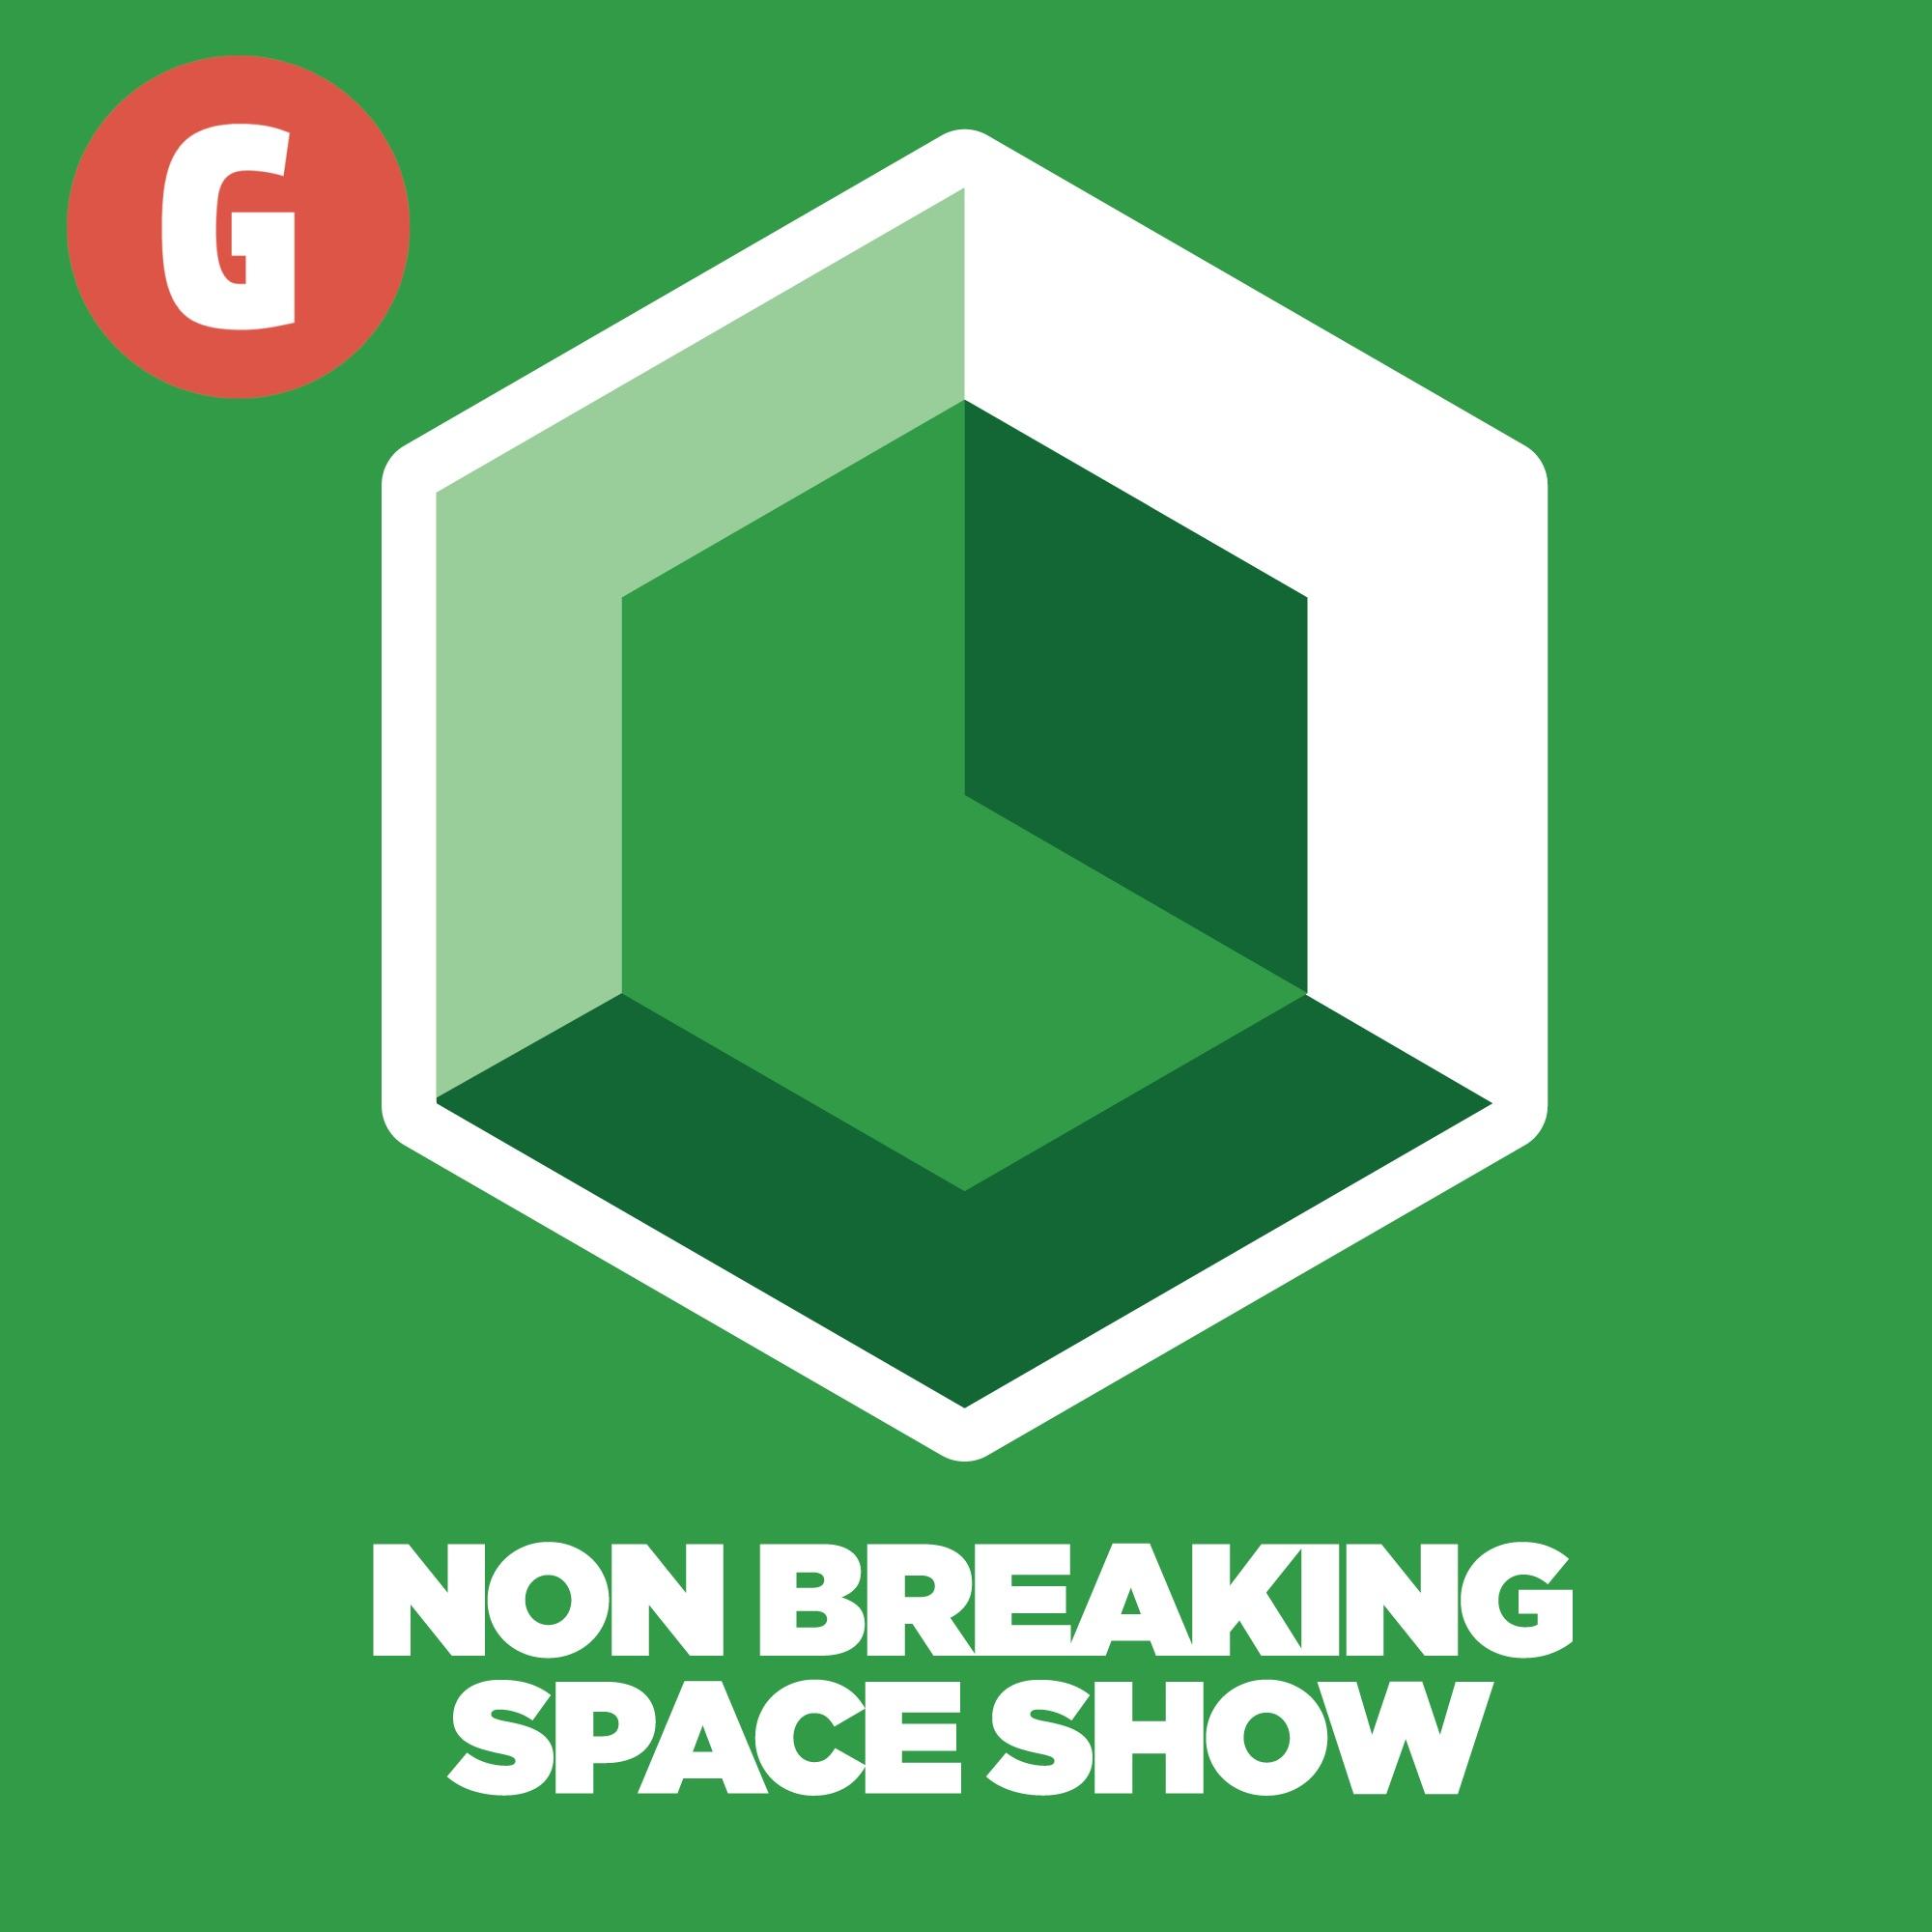 <![CDATA[Non Breaking Space Show]]>